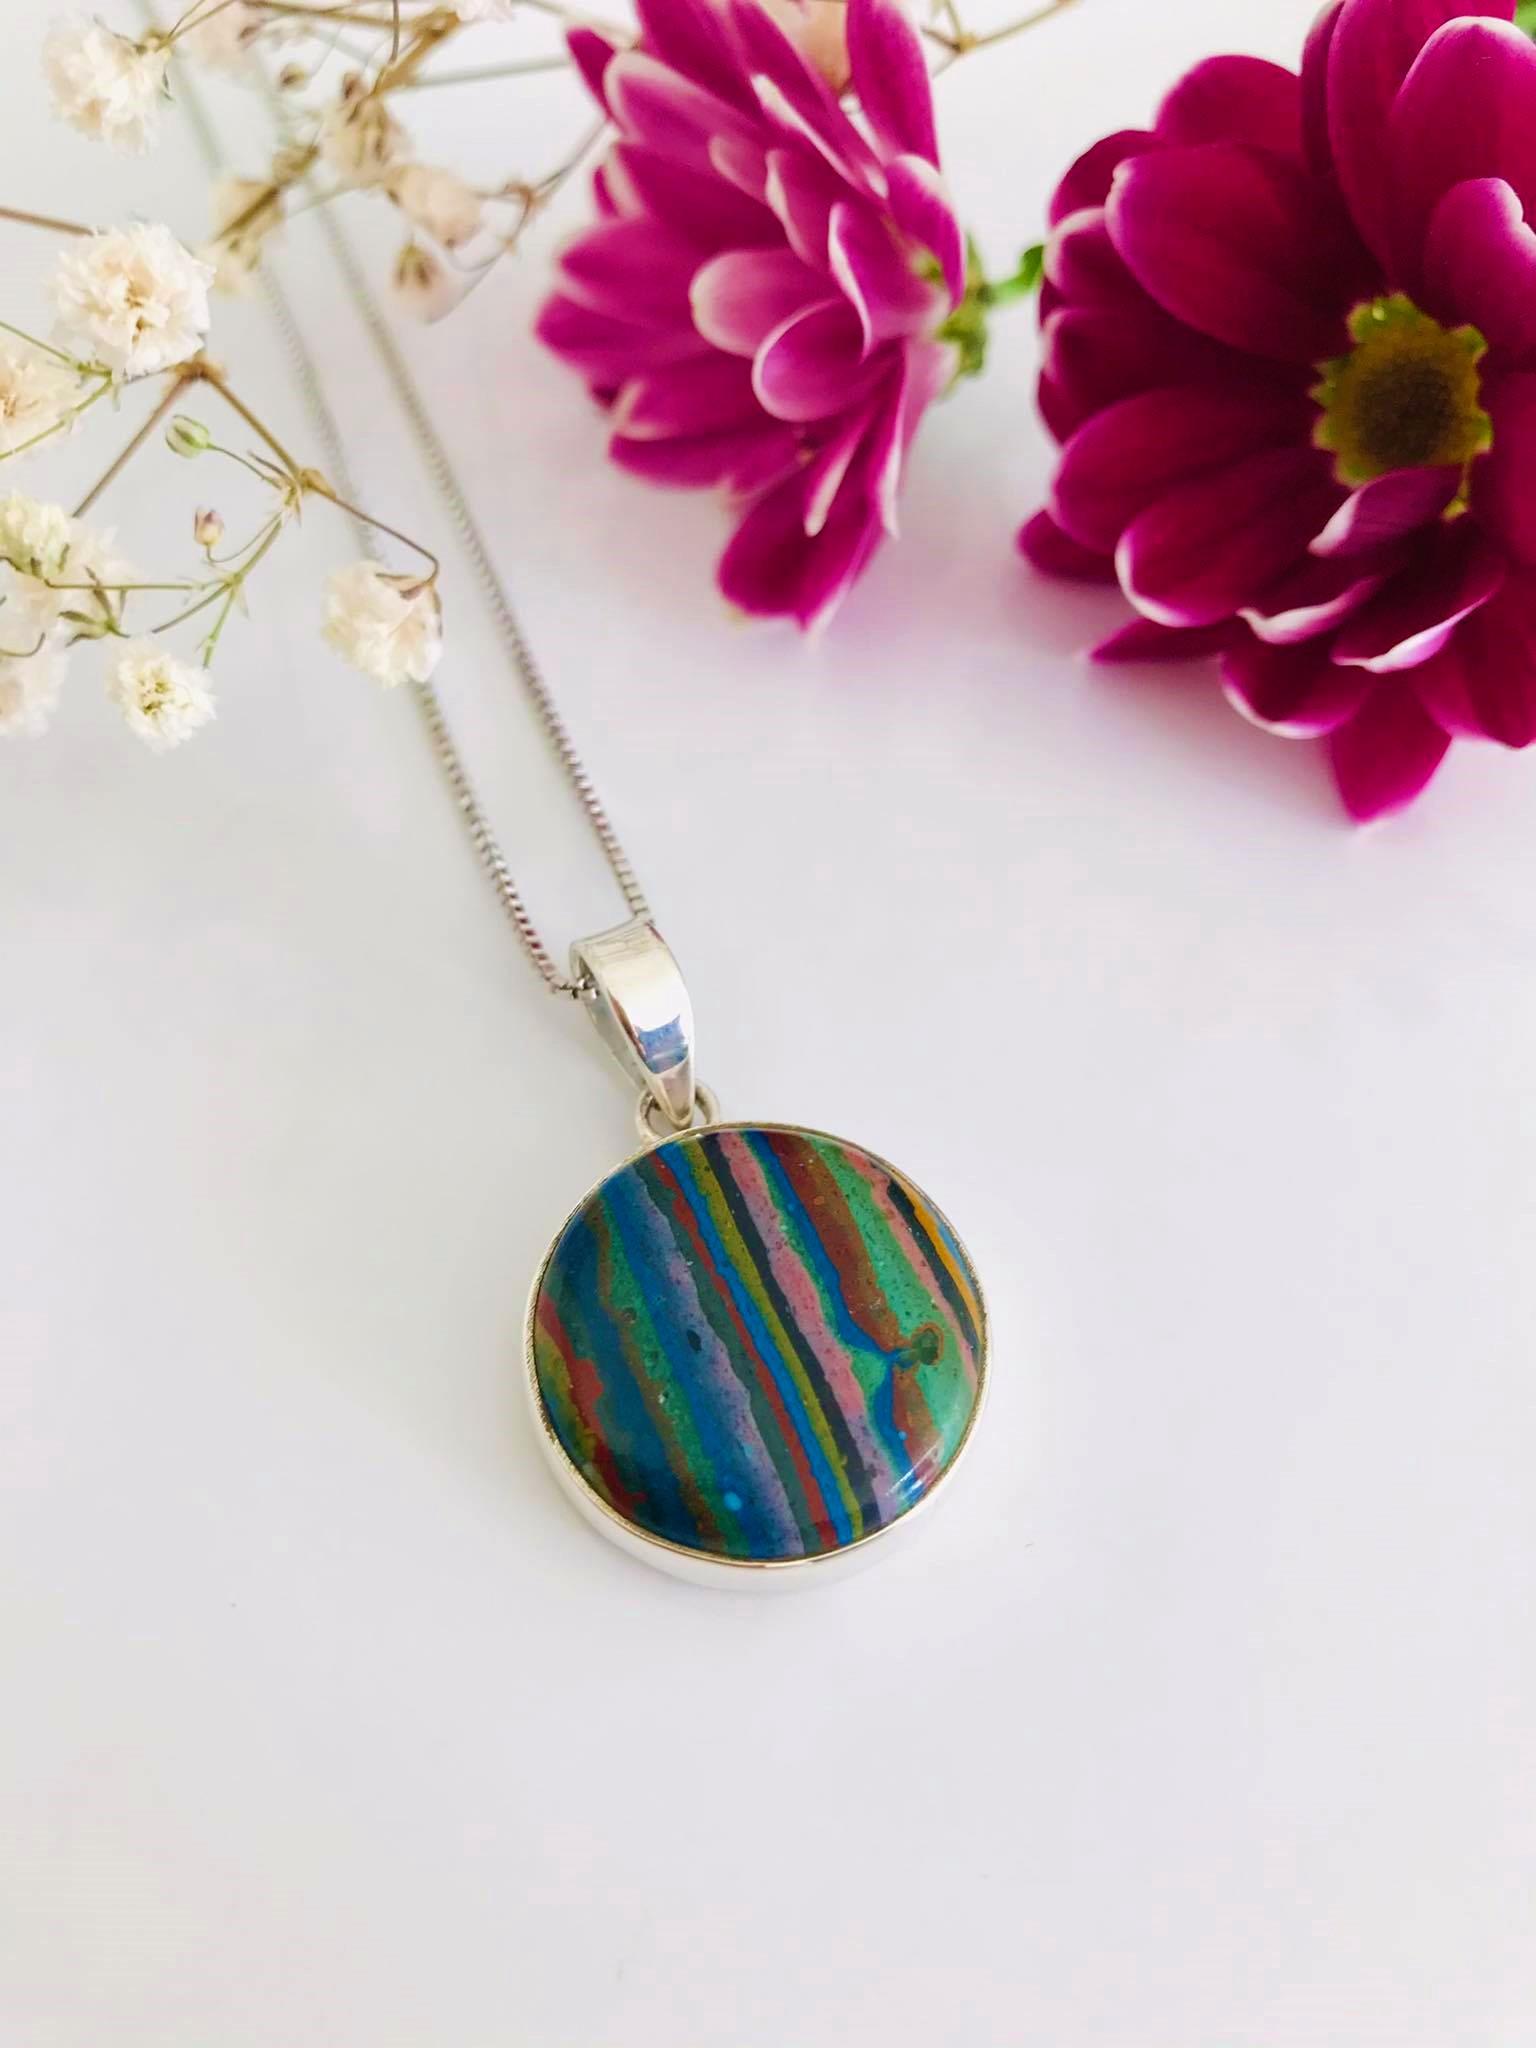 Rainbow Calsilica set in Silver Necklace Image